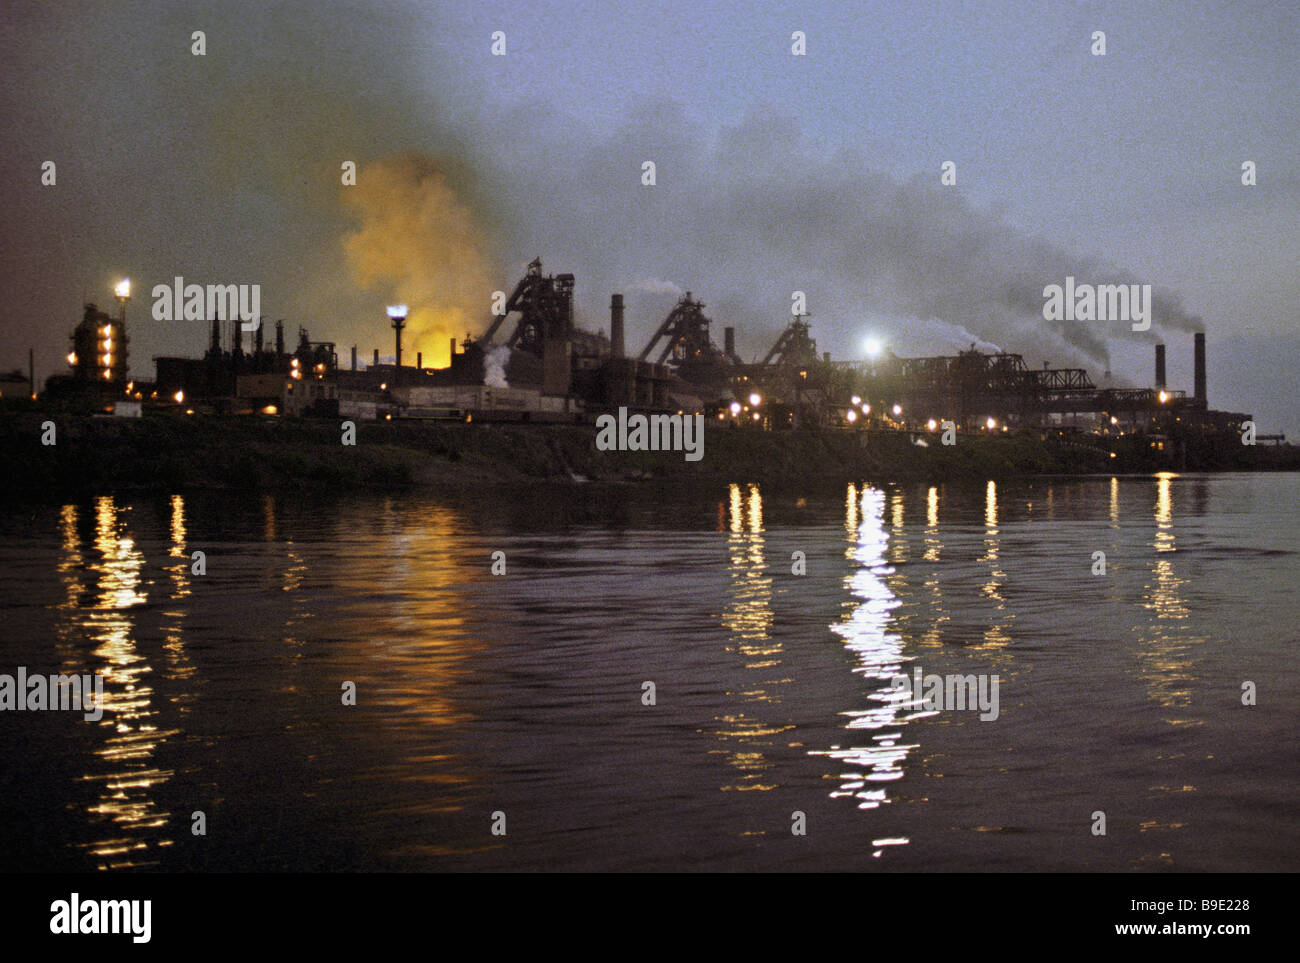 Dneprodzerzhinsk Metals Works - Stock Image